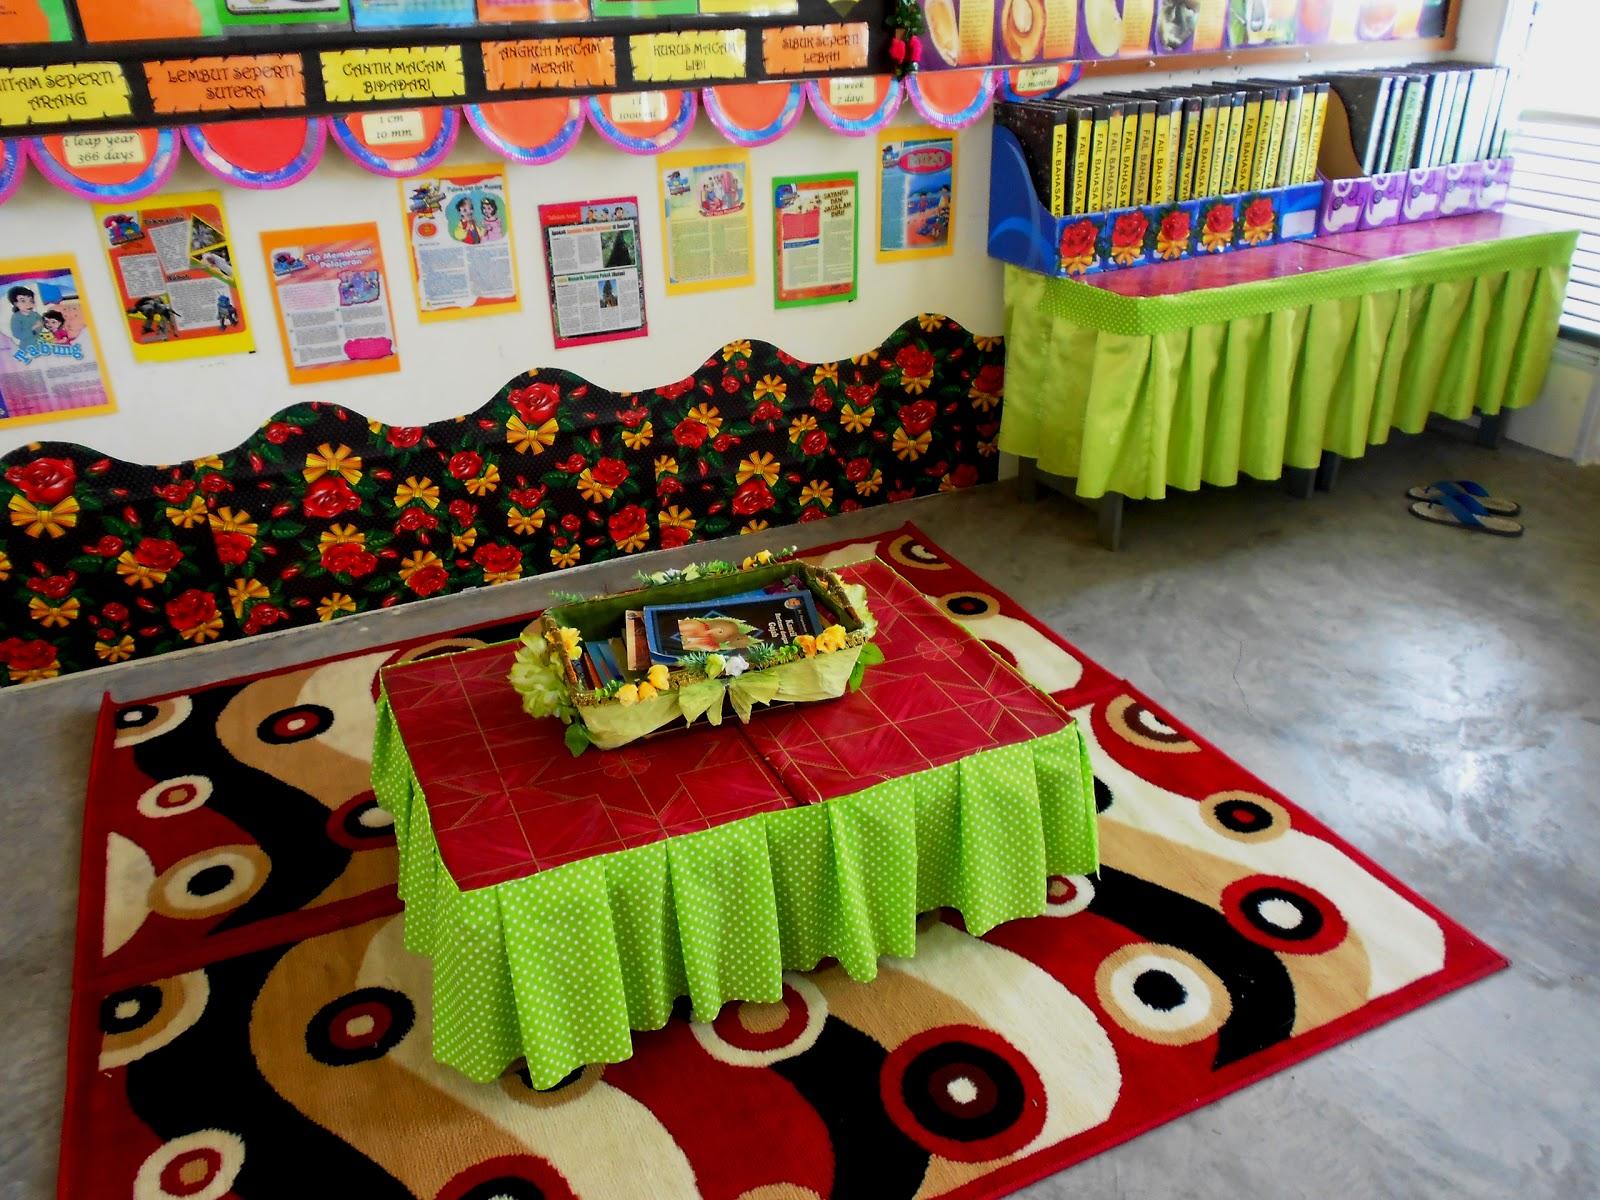 Ruangan Membaca Dan Santai Di Belakang Kelas